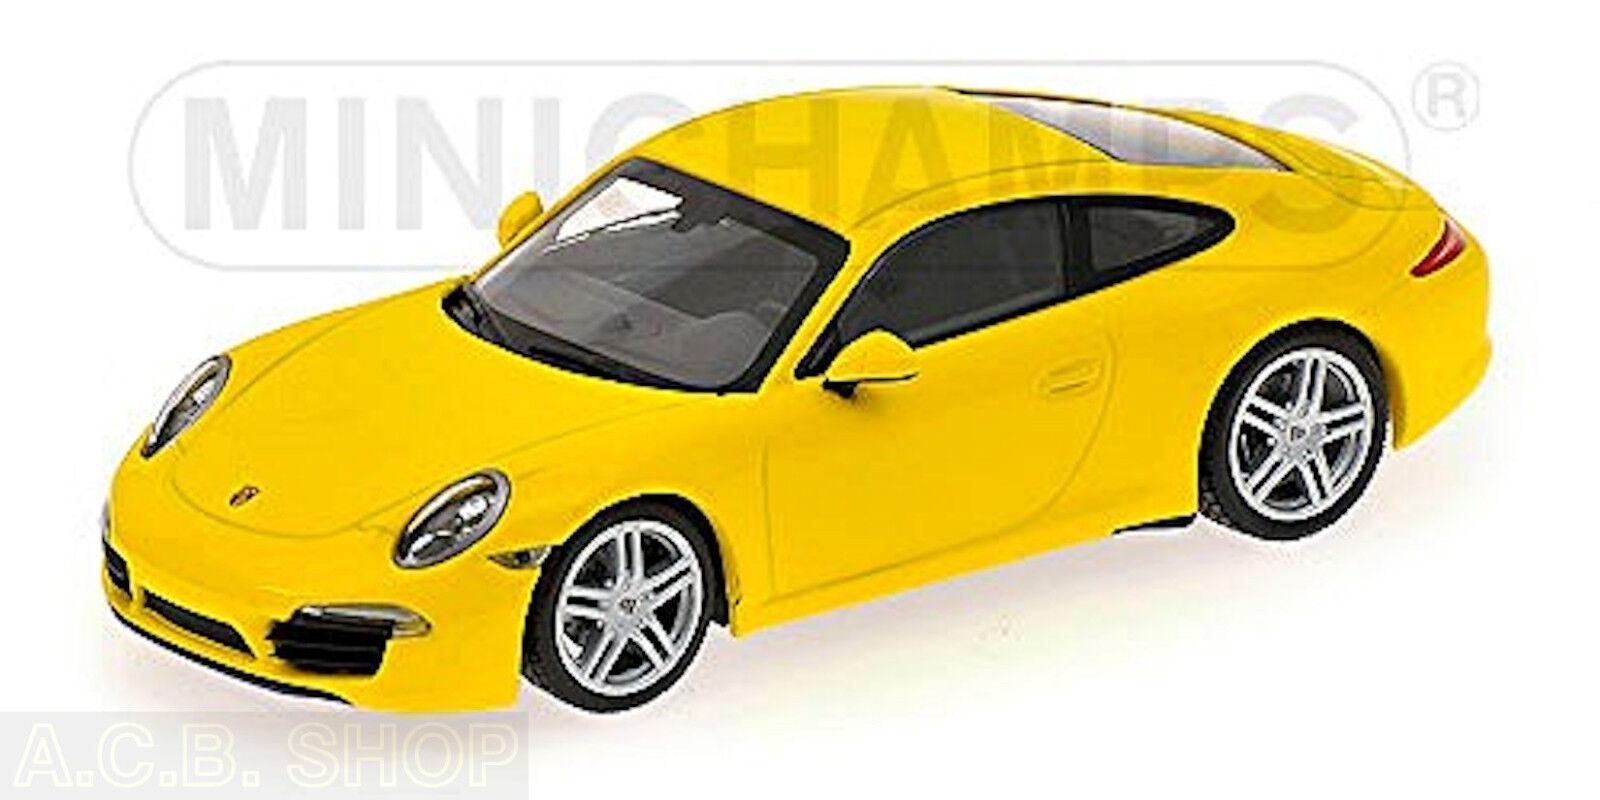 Porsche 911 Carrera Type 991 Coupé 2012-15 Speed Jaune jaune 1 43 Minichamps